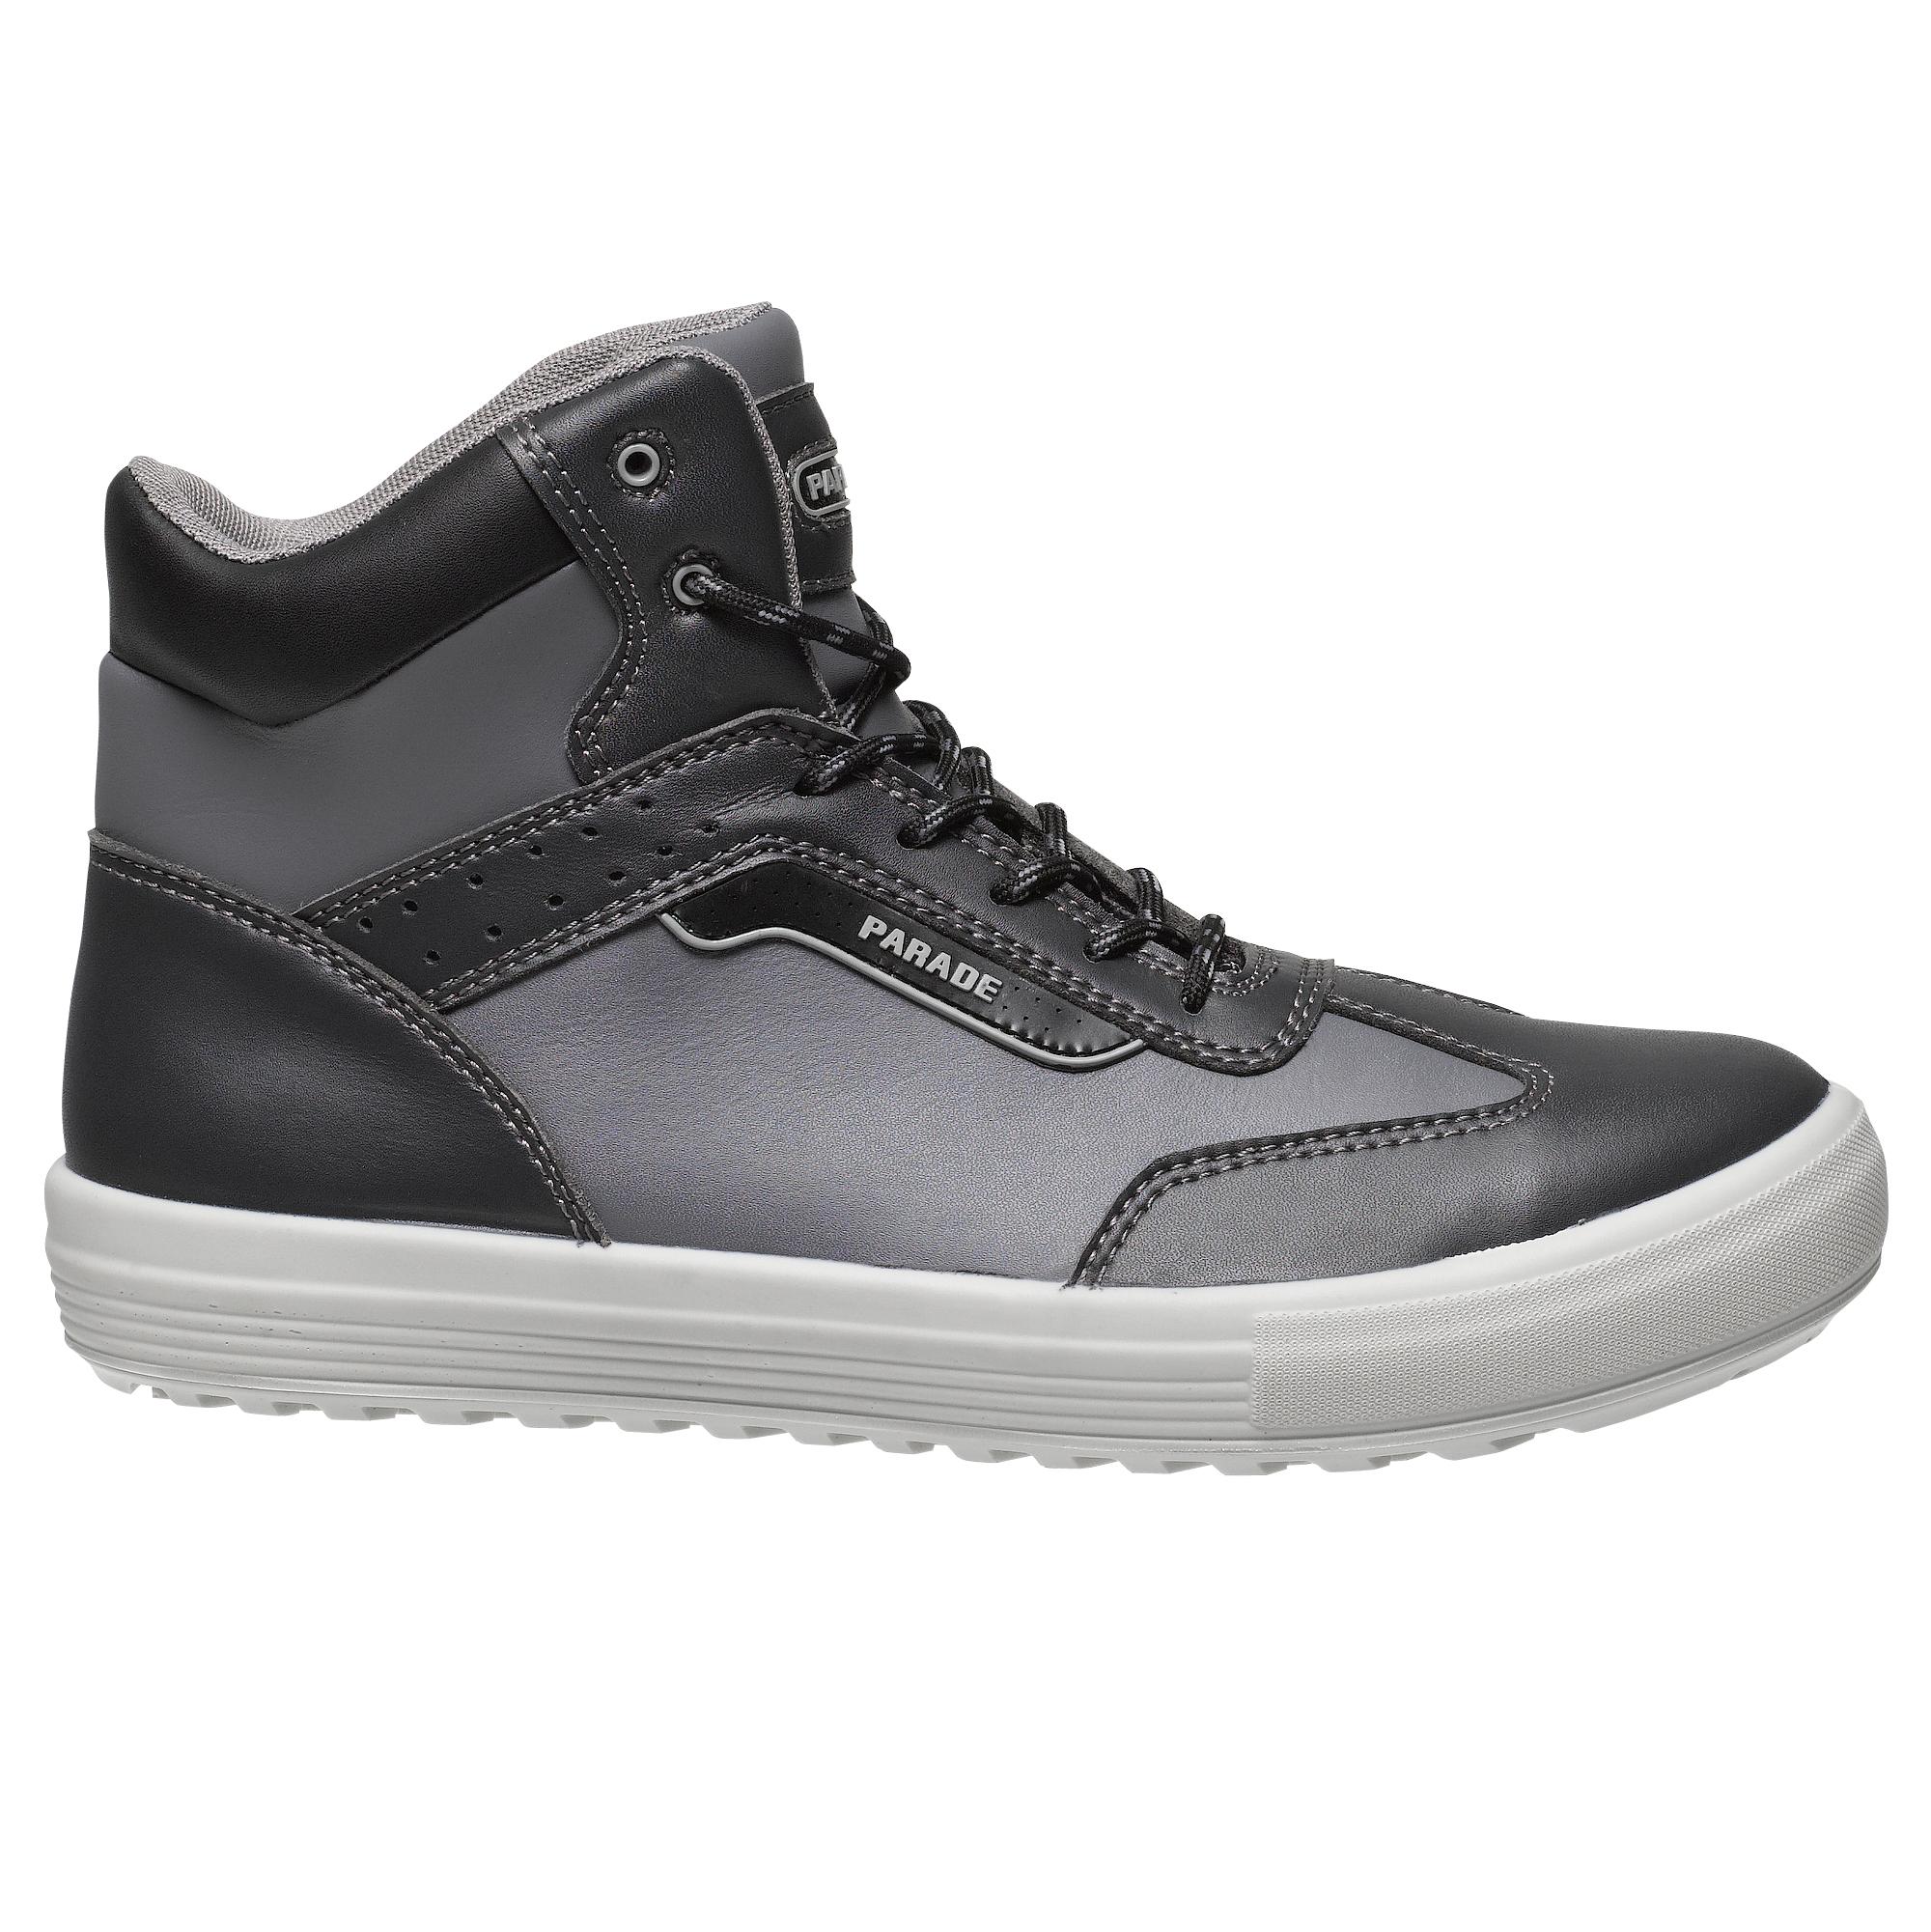 Chaussure de securite sncf